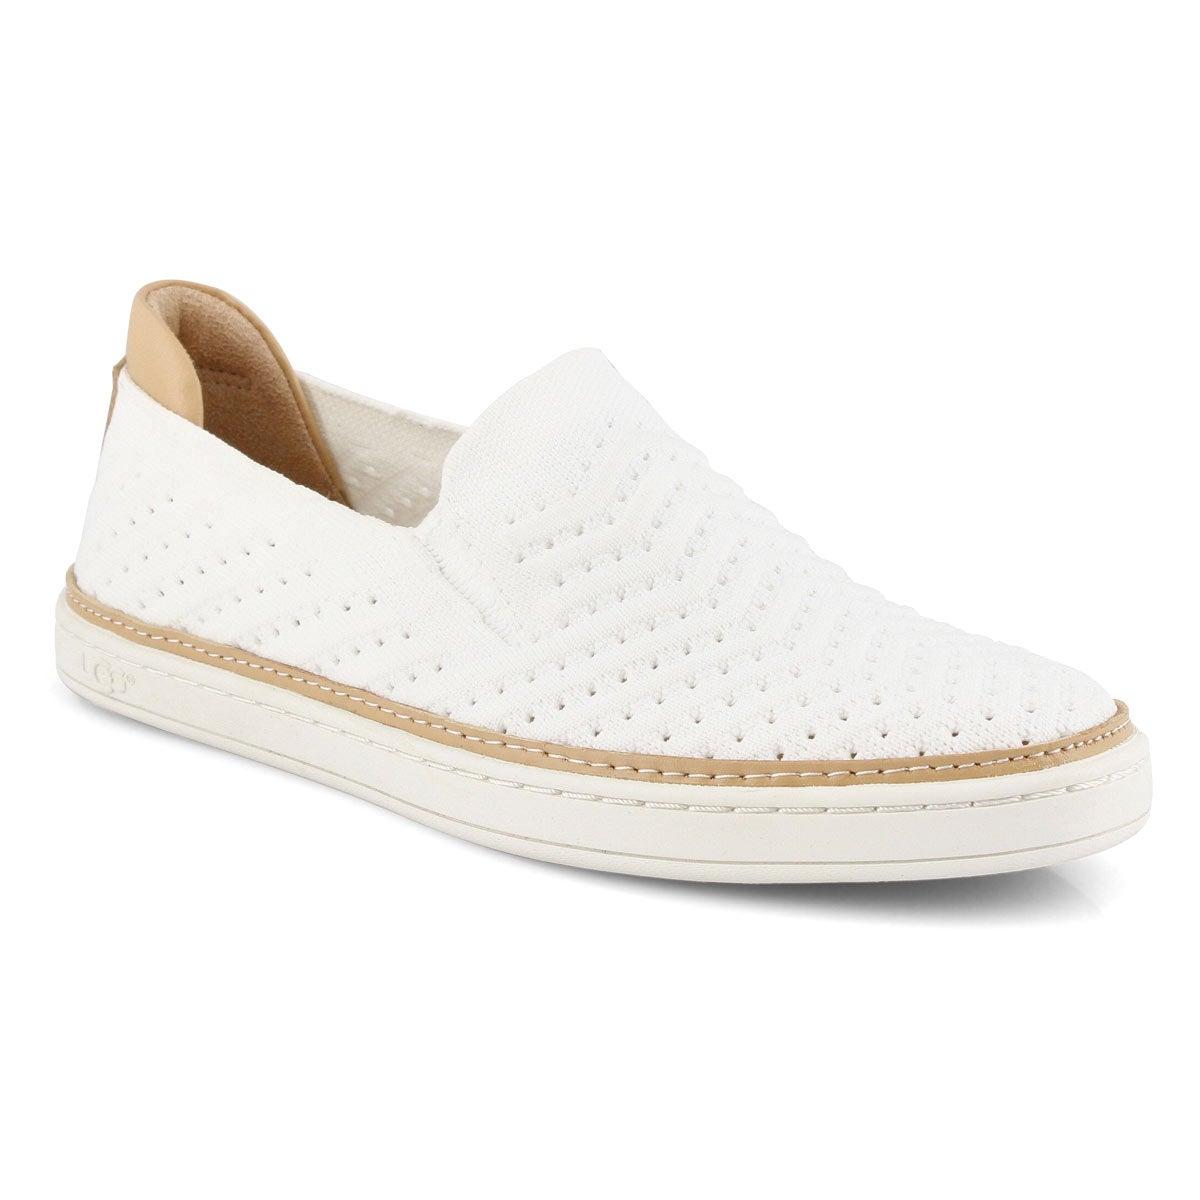 Women's Sammy Chevron Casual Slip On Shoe - White